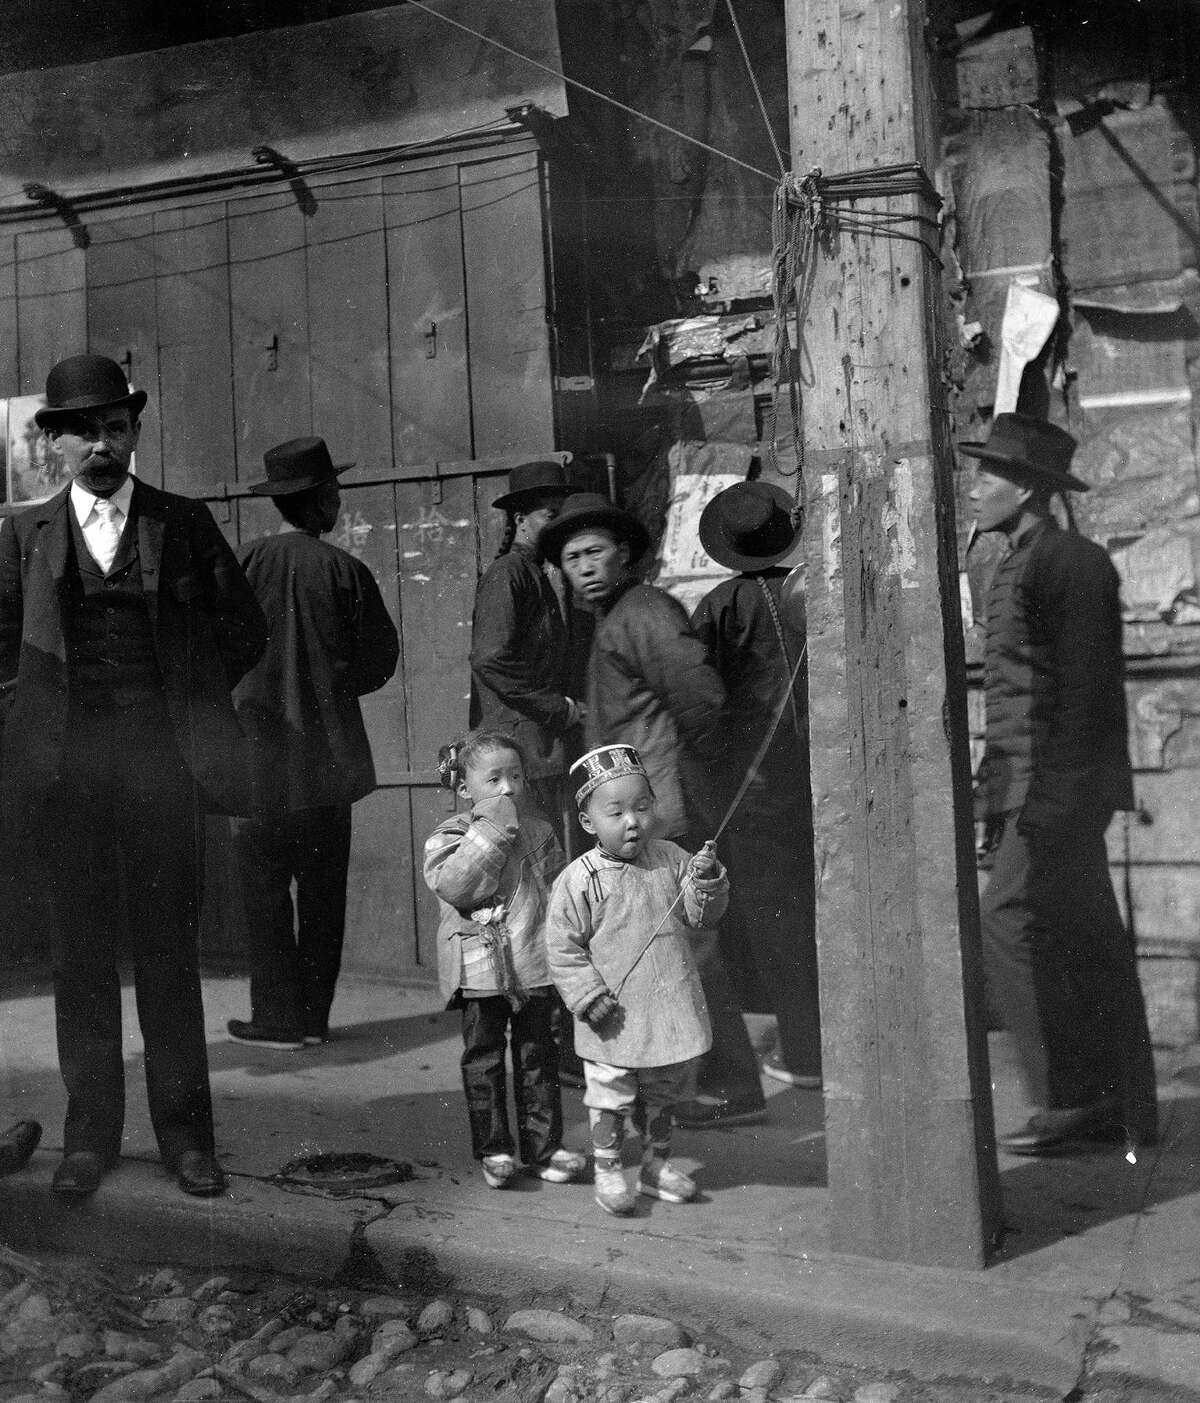 A holiday, Chinatown, San Francisco, between 1896 and 1906.